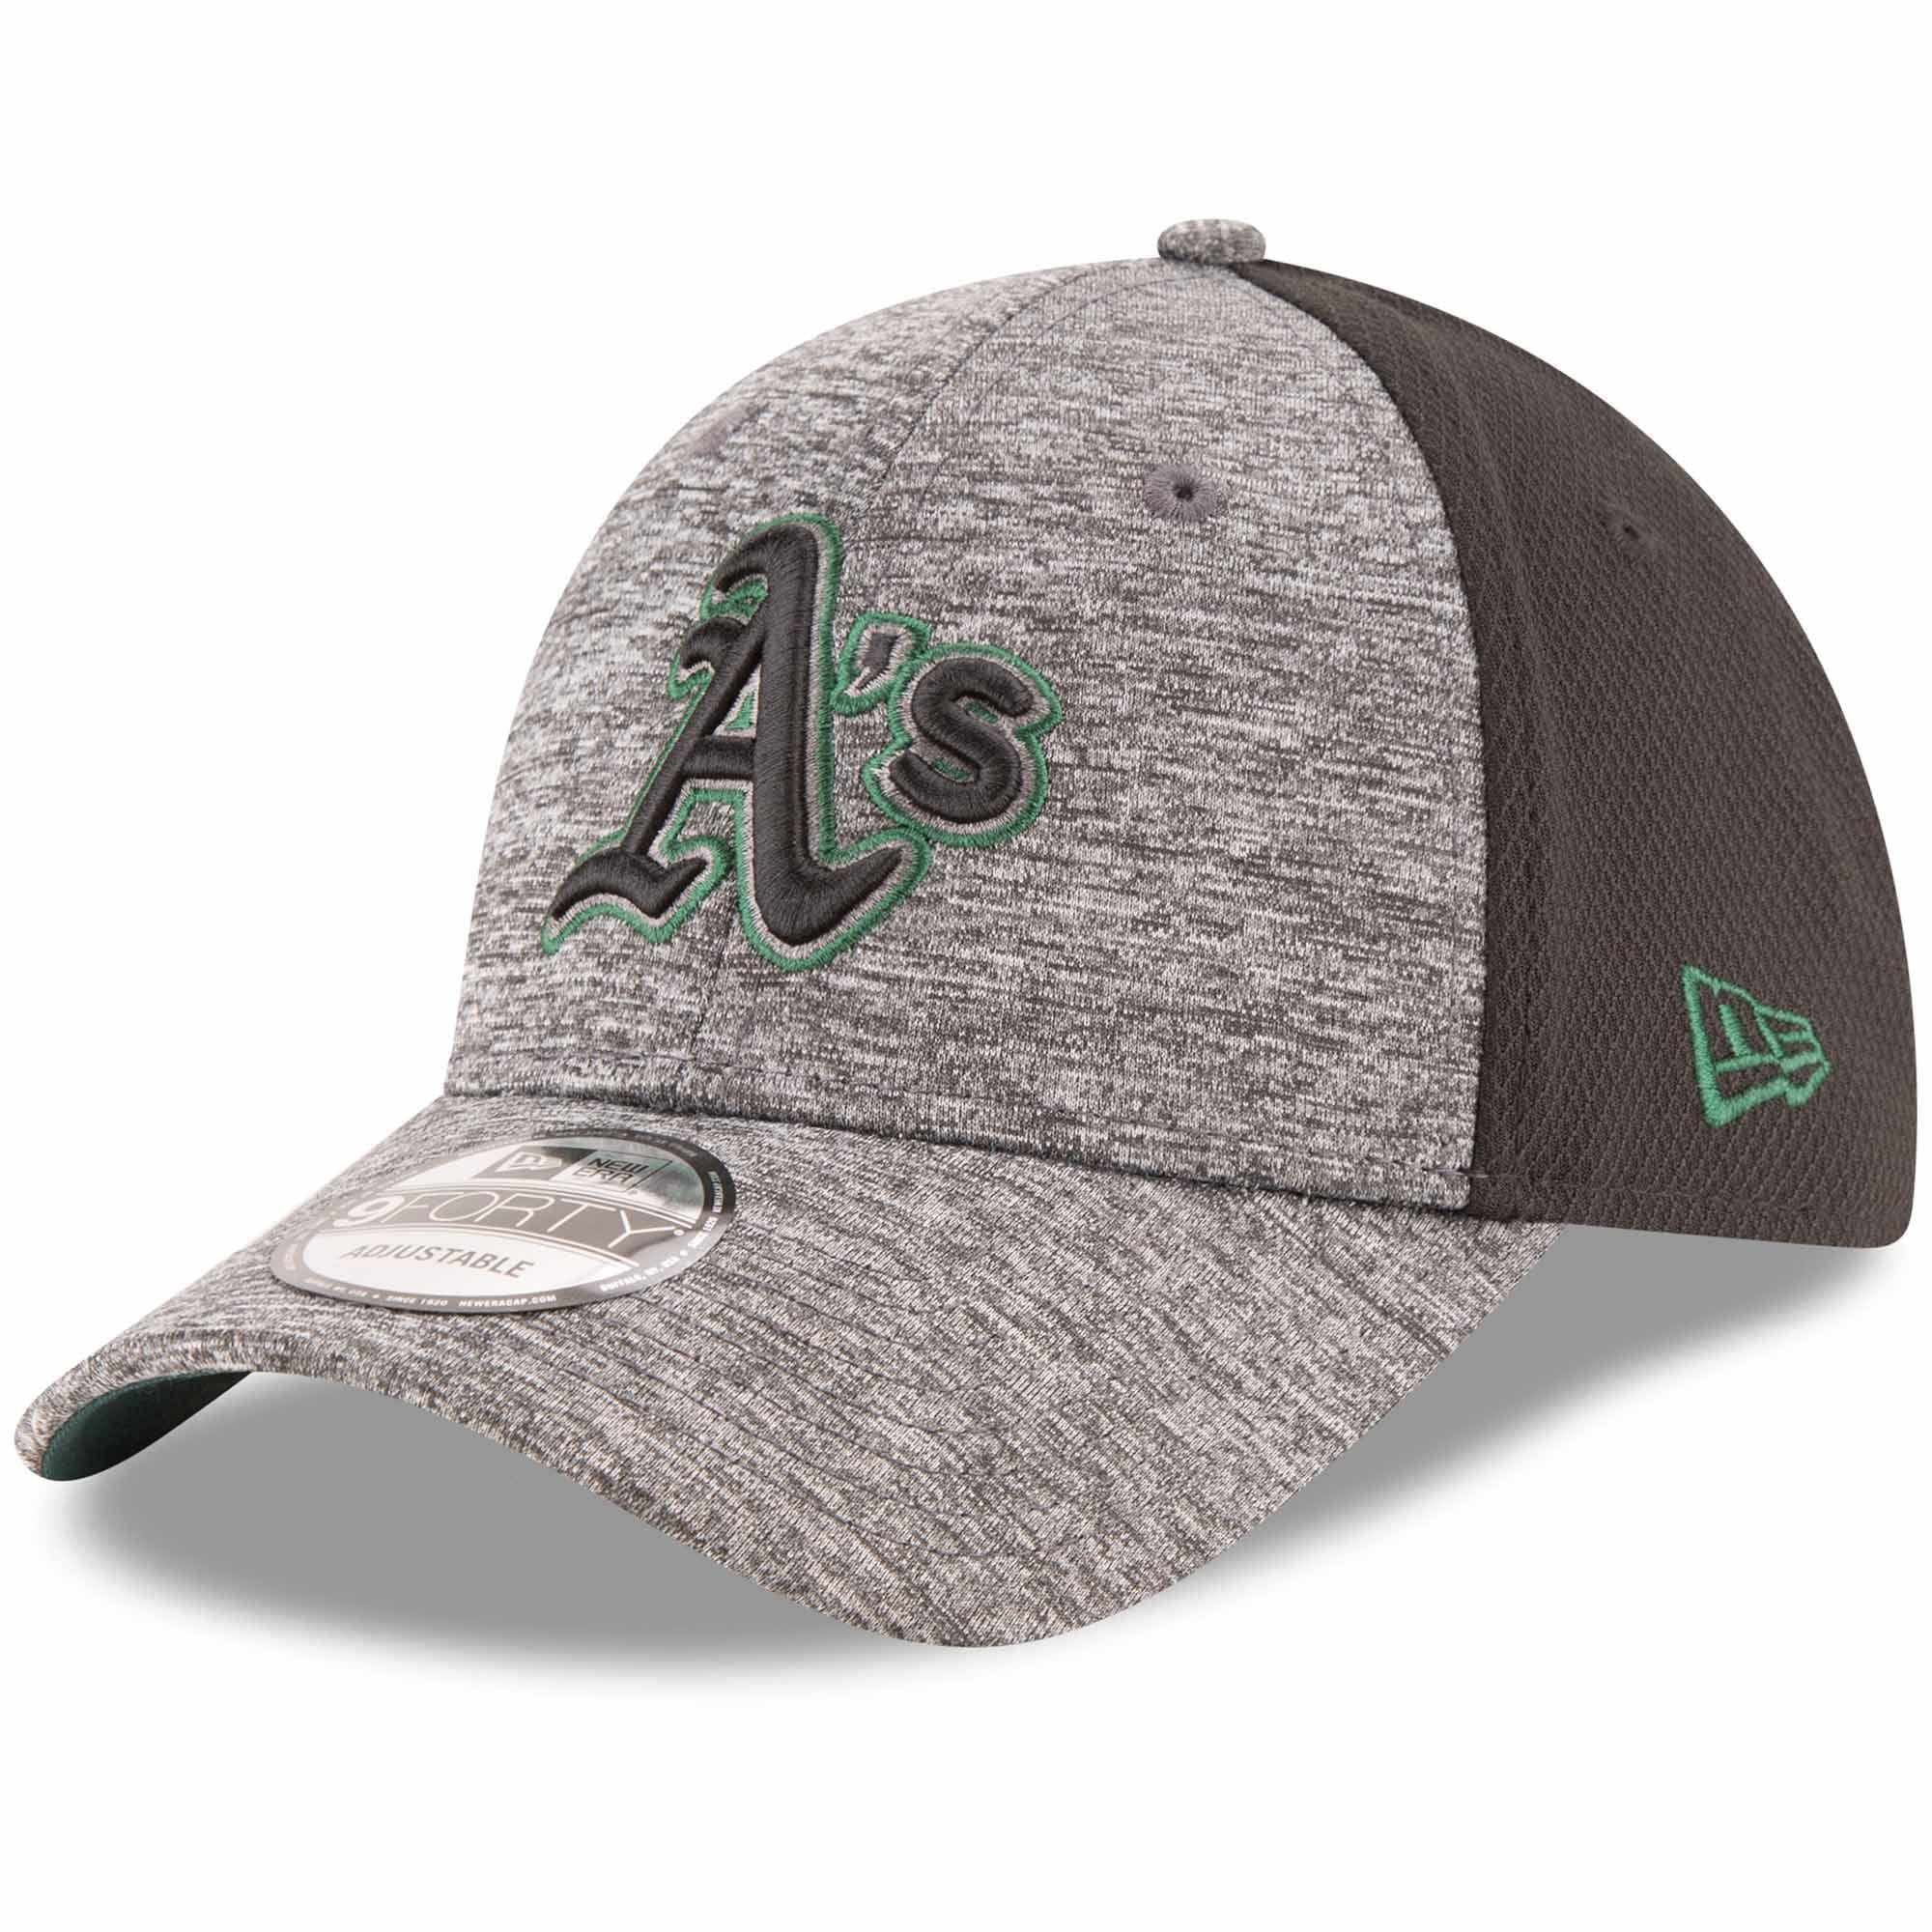 Oakland Athletics New Era Shadowed Team Logo 9FORTY Adjustable Hat - Heathered Gray/Black - OSFA